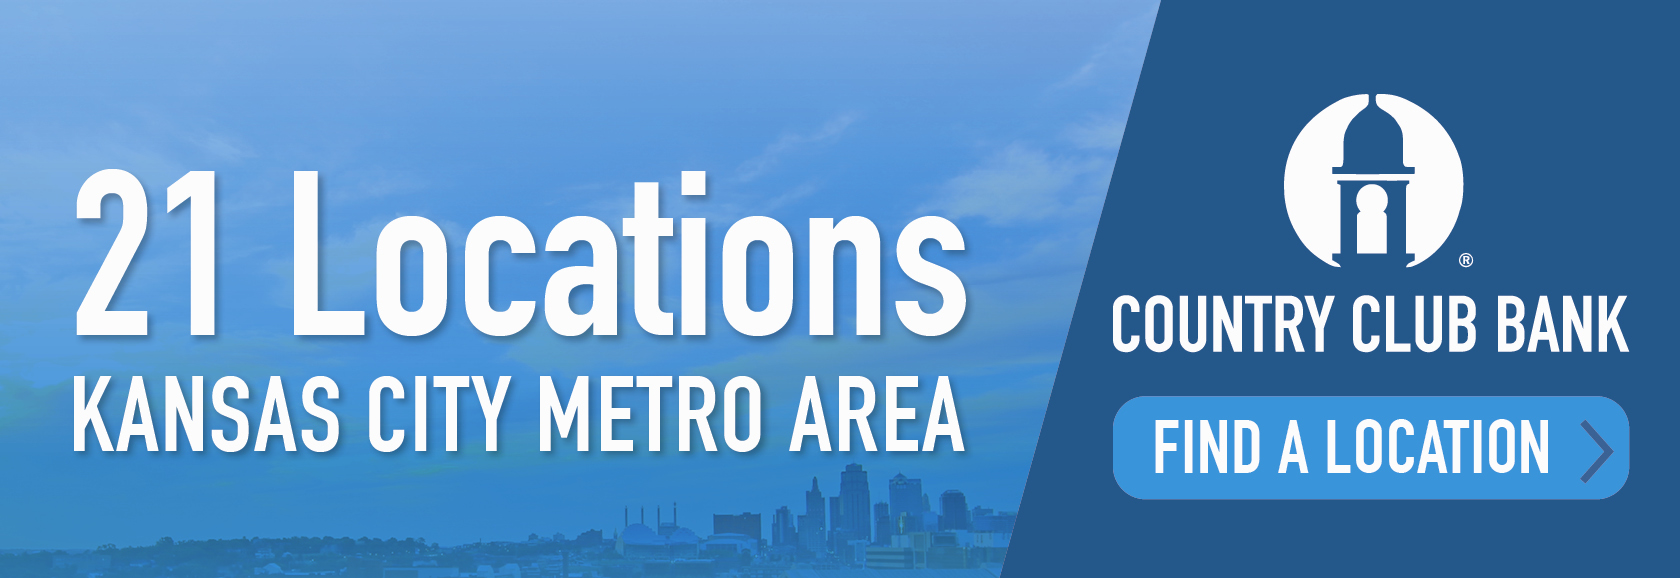 21 Locations. Kansas City Metro Area. Find a location.